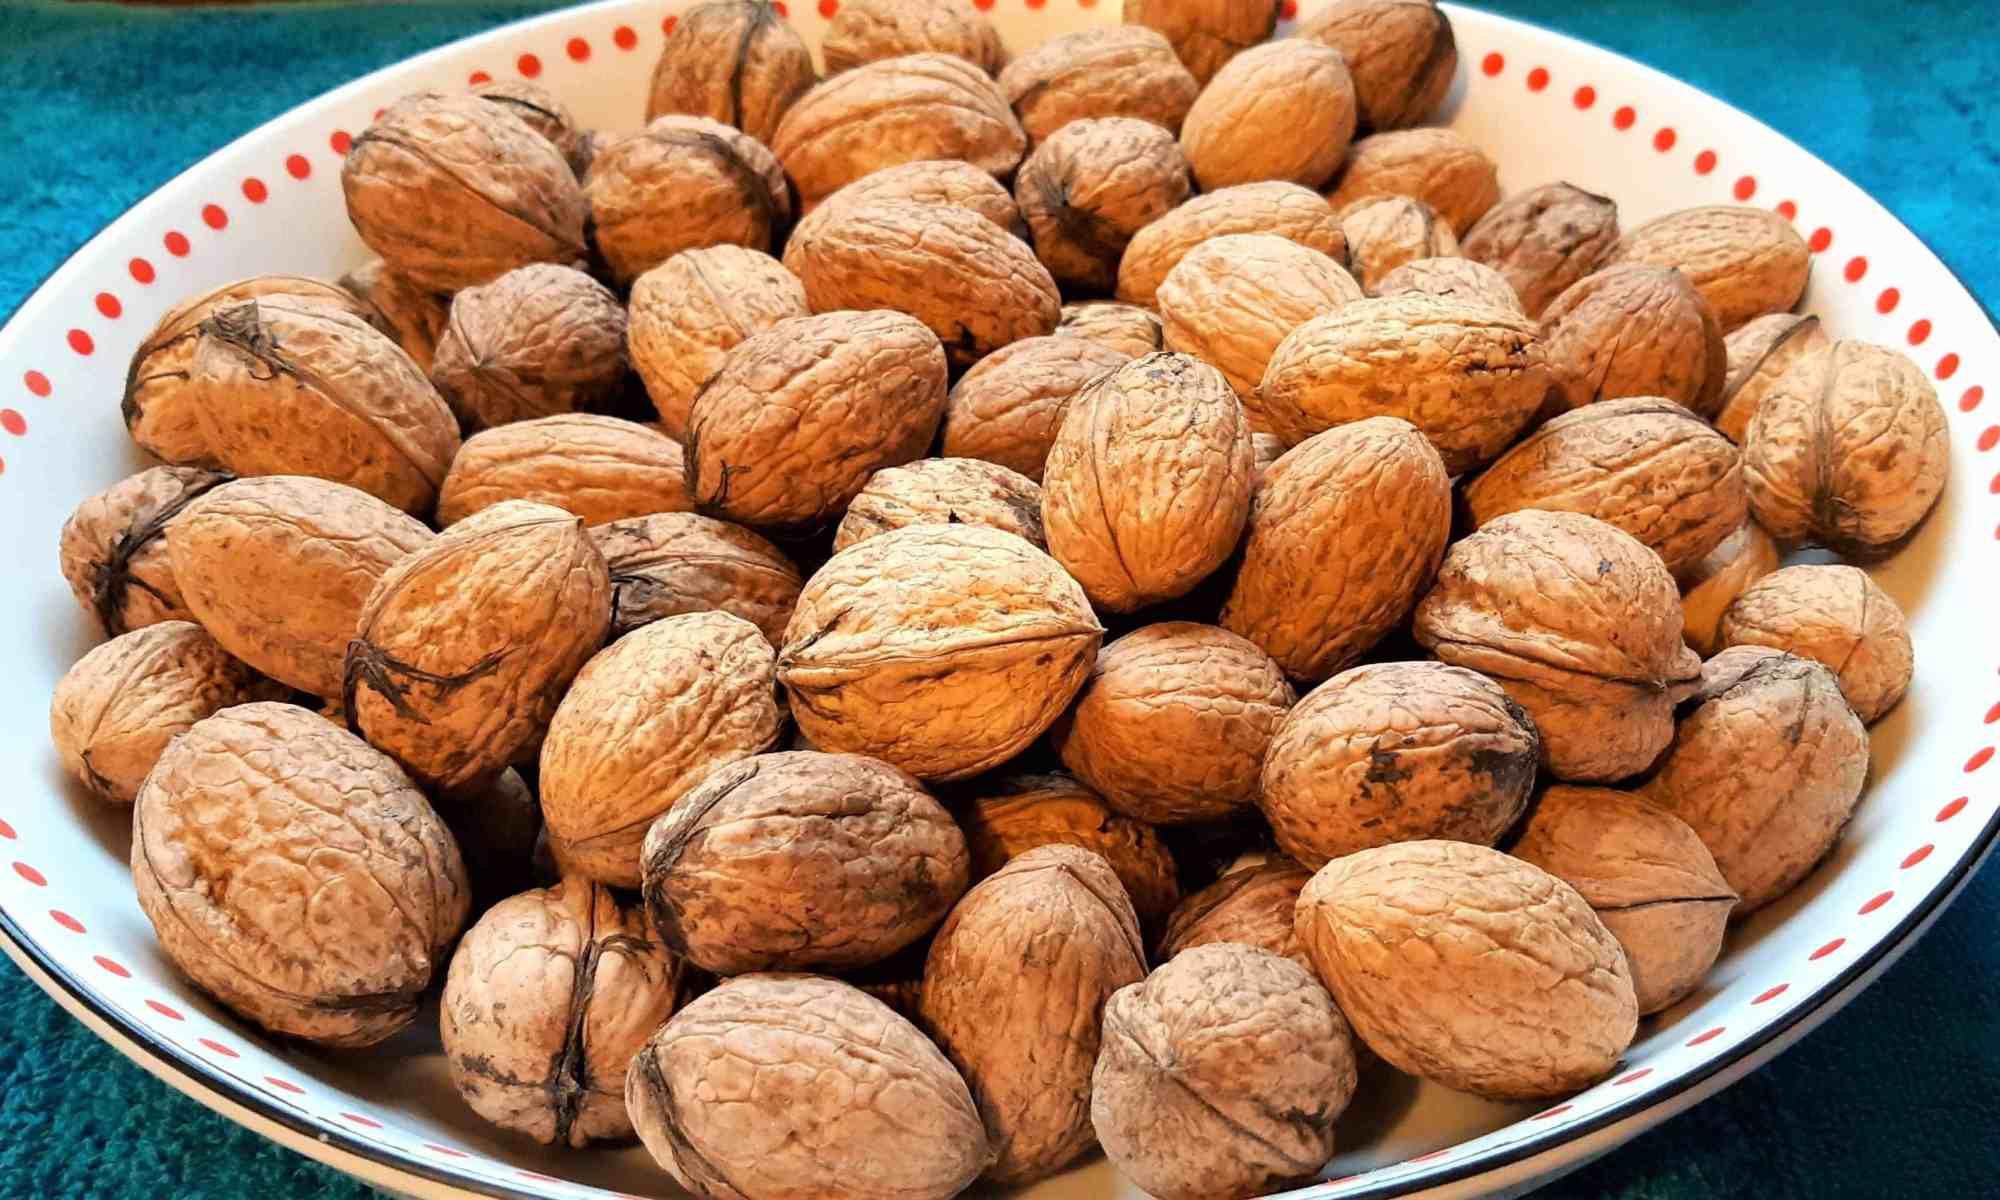 Walnuts from the walnut trees on the farm.